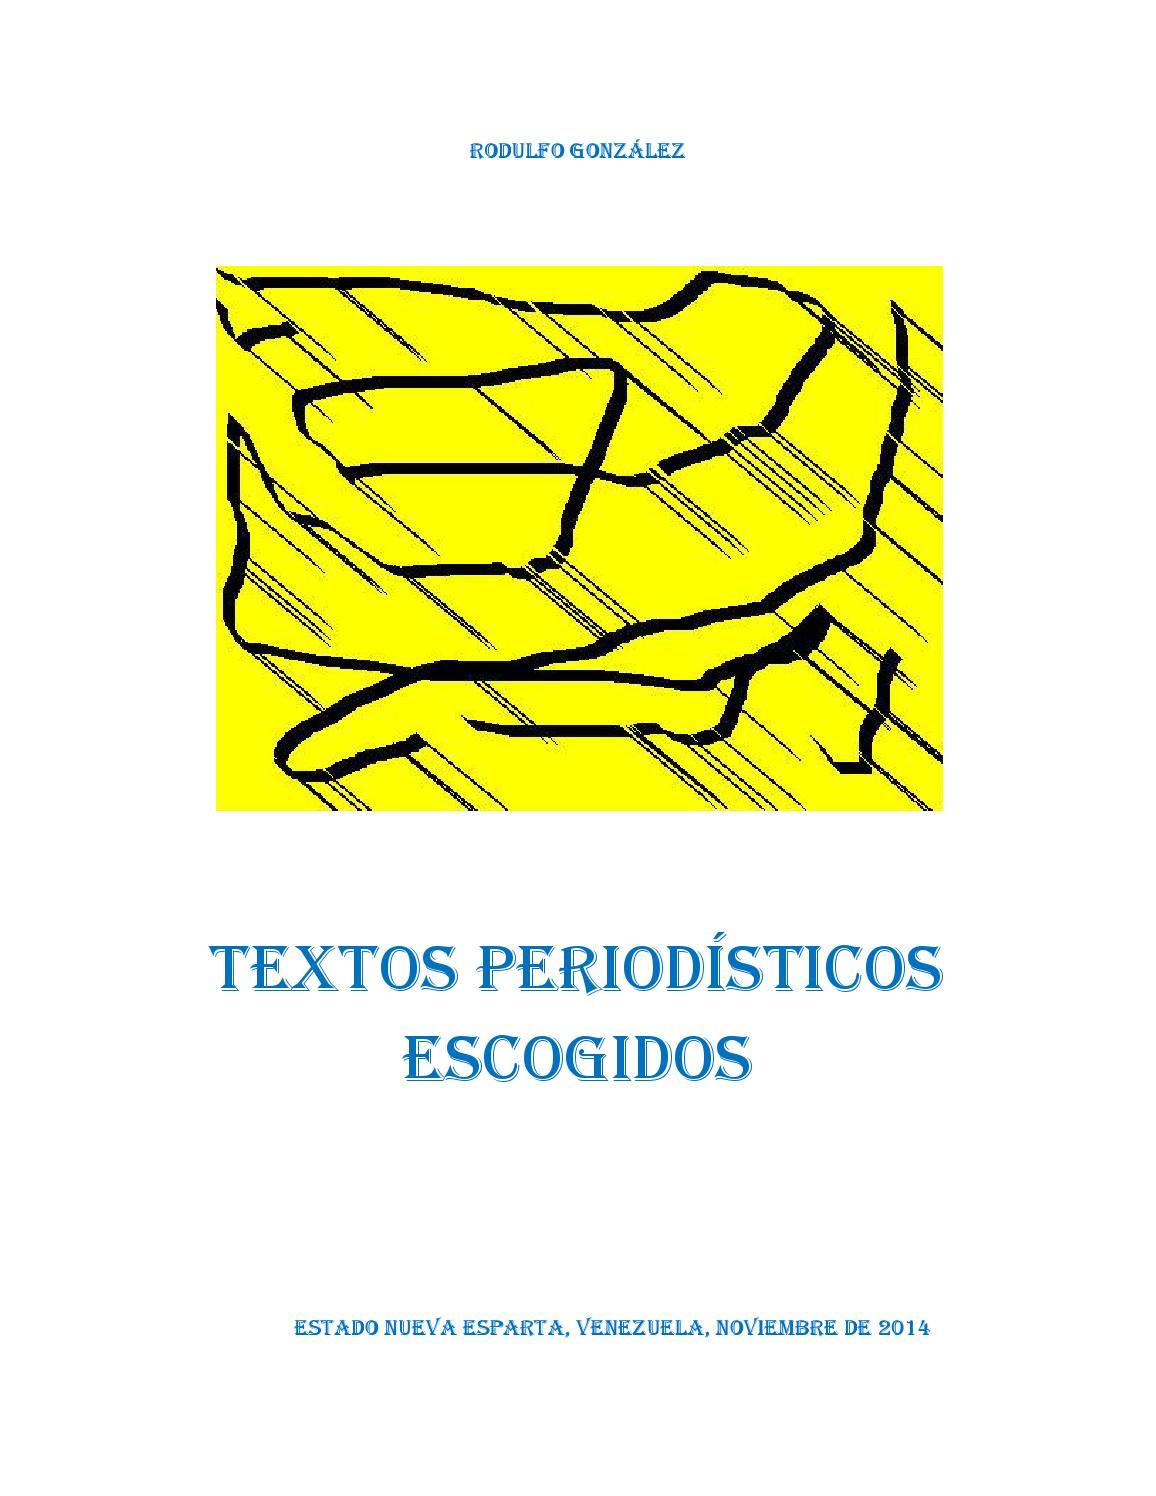 Tribuna La Muralla Extra 1995 210 By Revista Tribunalamuralla Issuu # Muebles Tovar Beniel